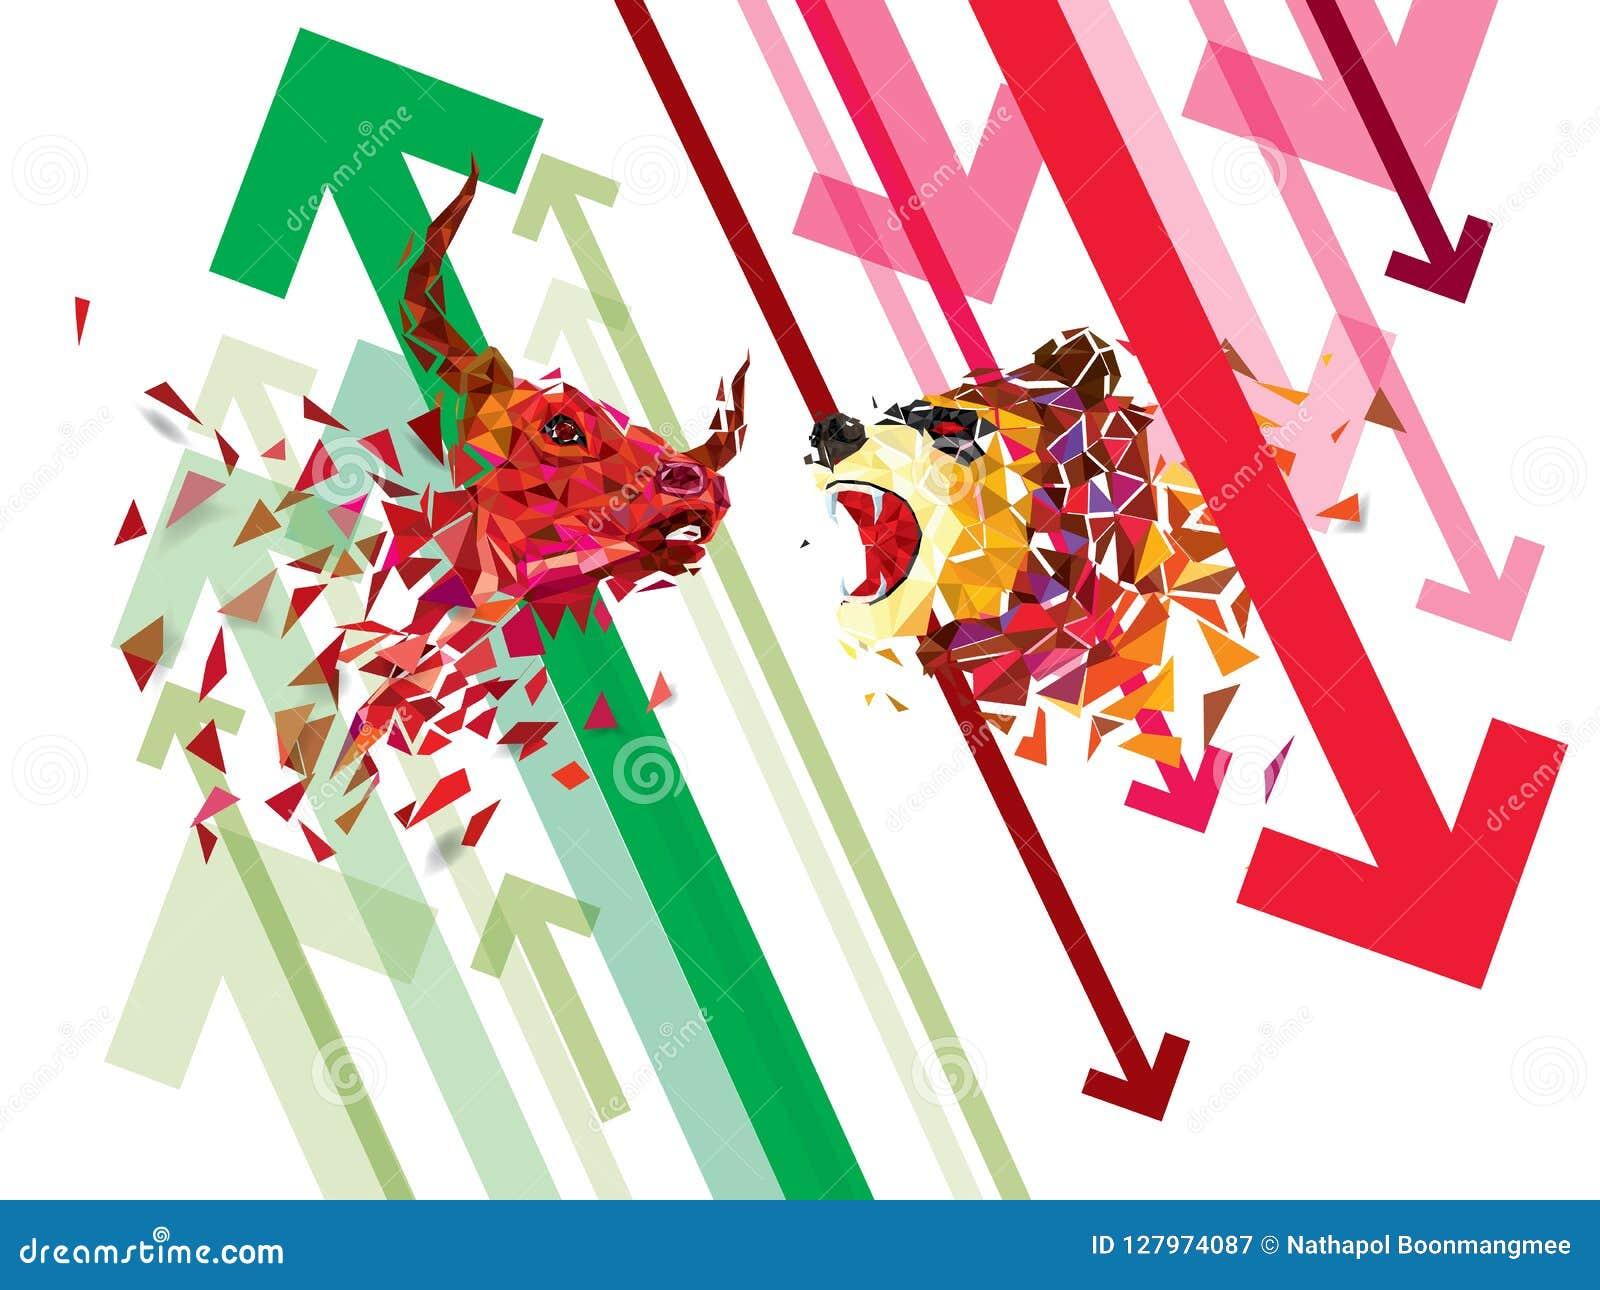 Bullish and bearish market forex index pakistan